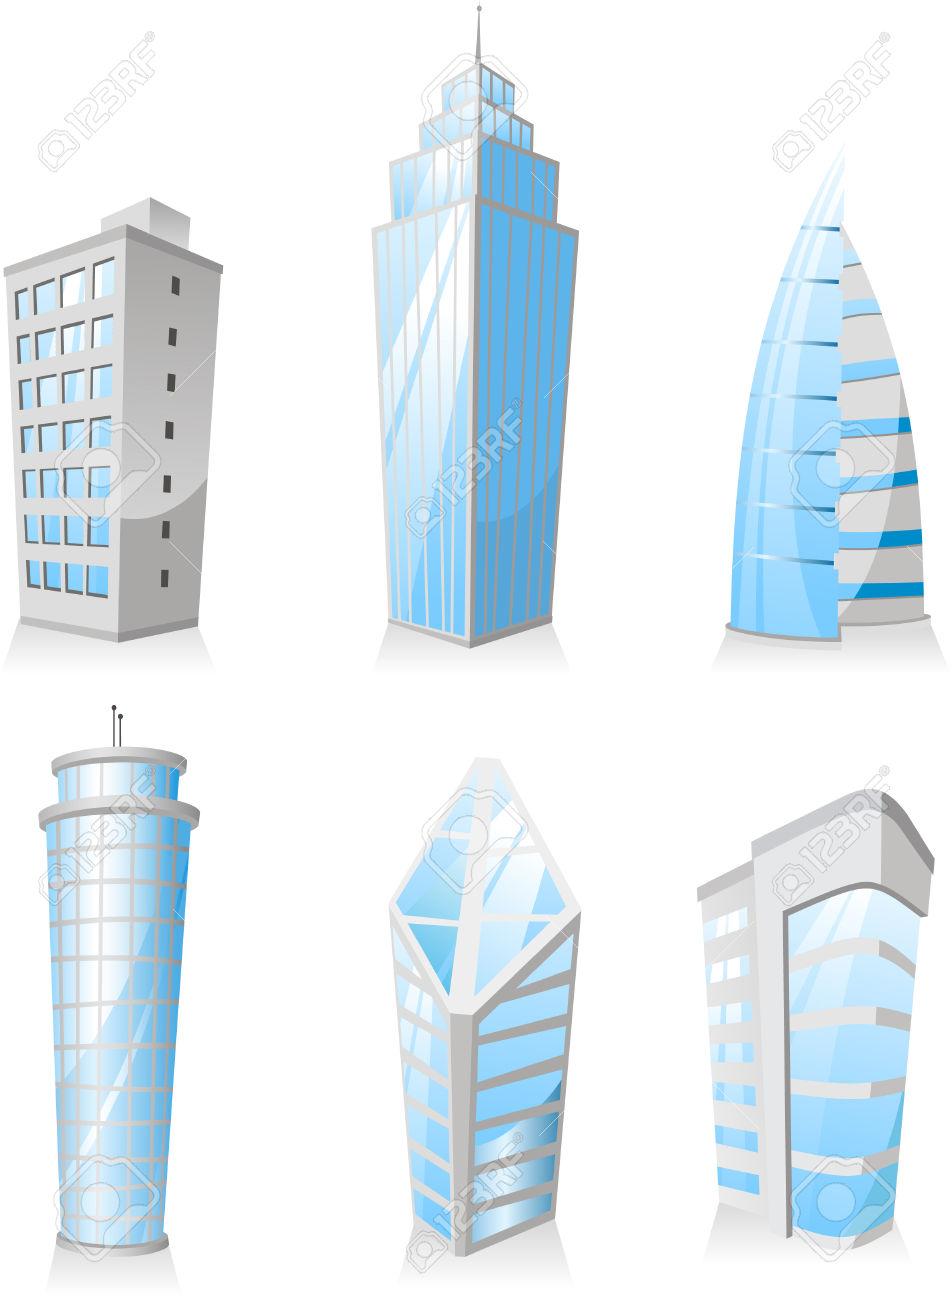 Skyscrapers Tower Skyscraper Apartment Penthouse Edifice Structure.